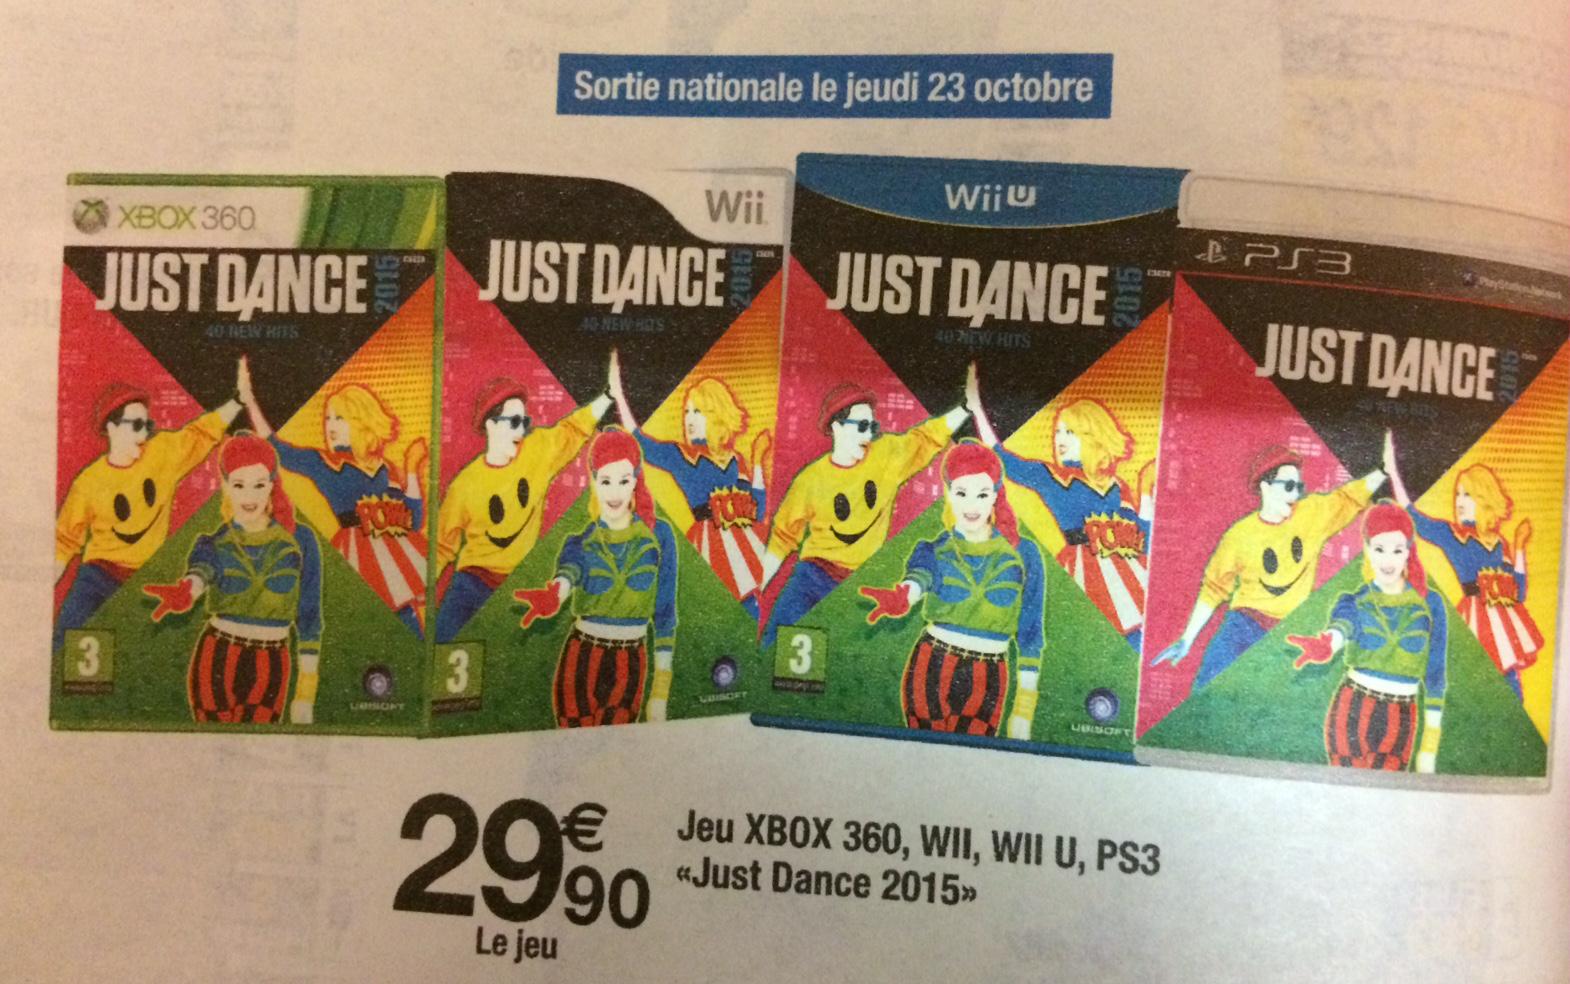 Just Dance 2015 sur Xbox 360, Wii, Wii U et PS3